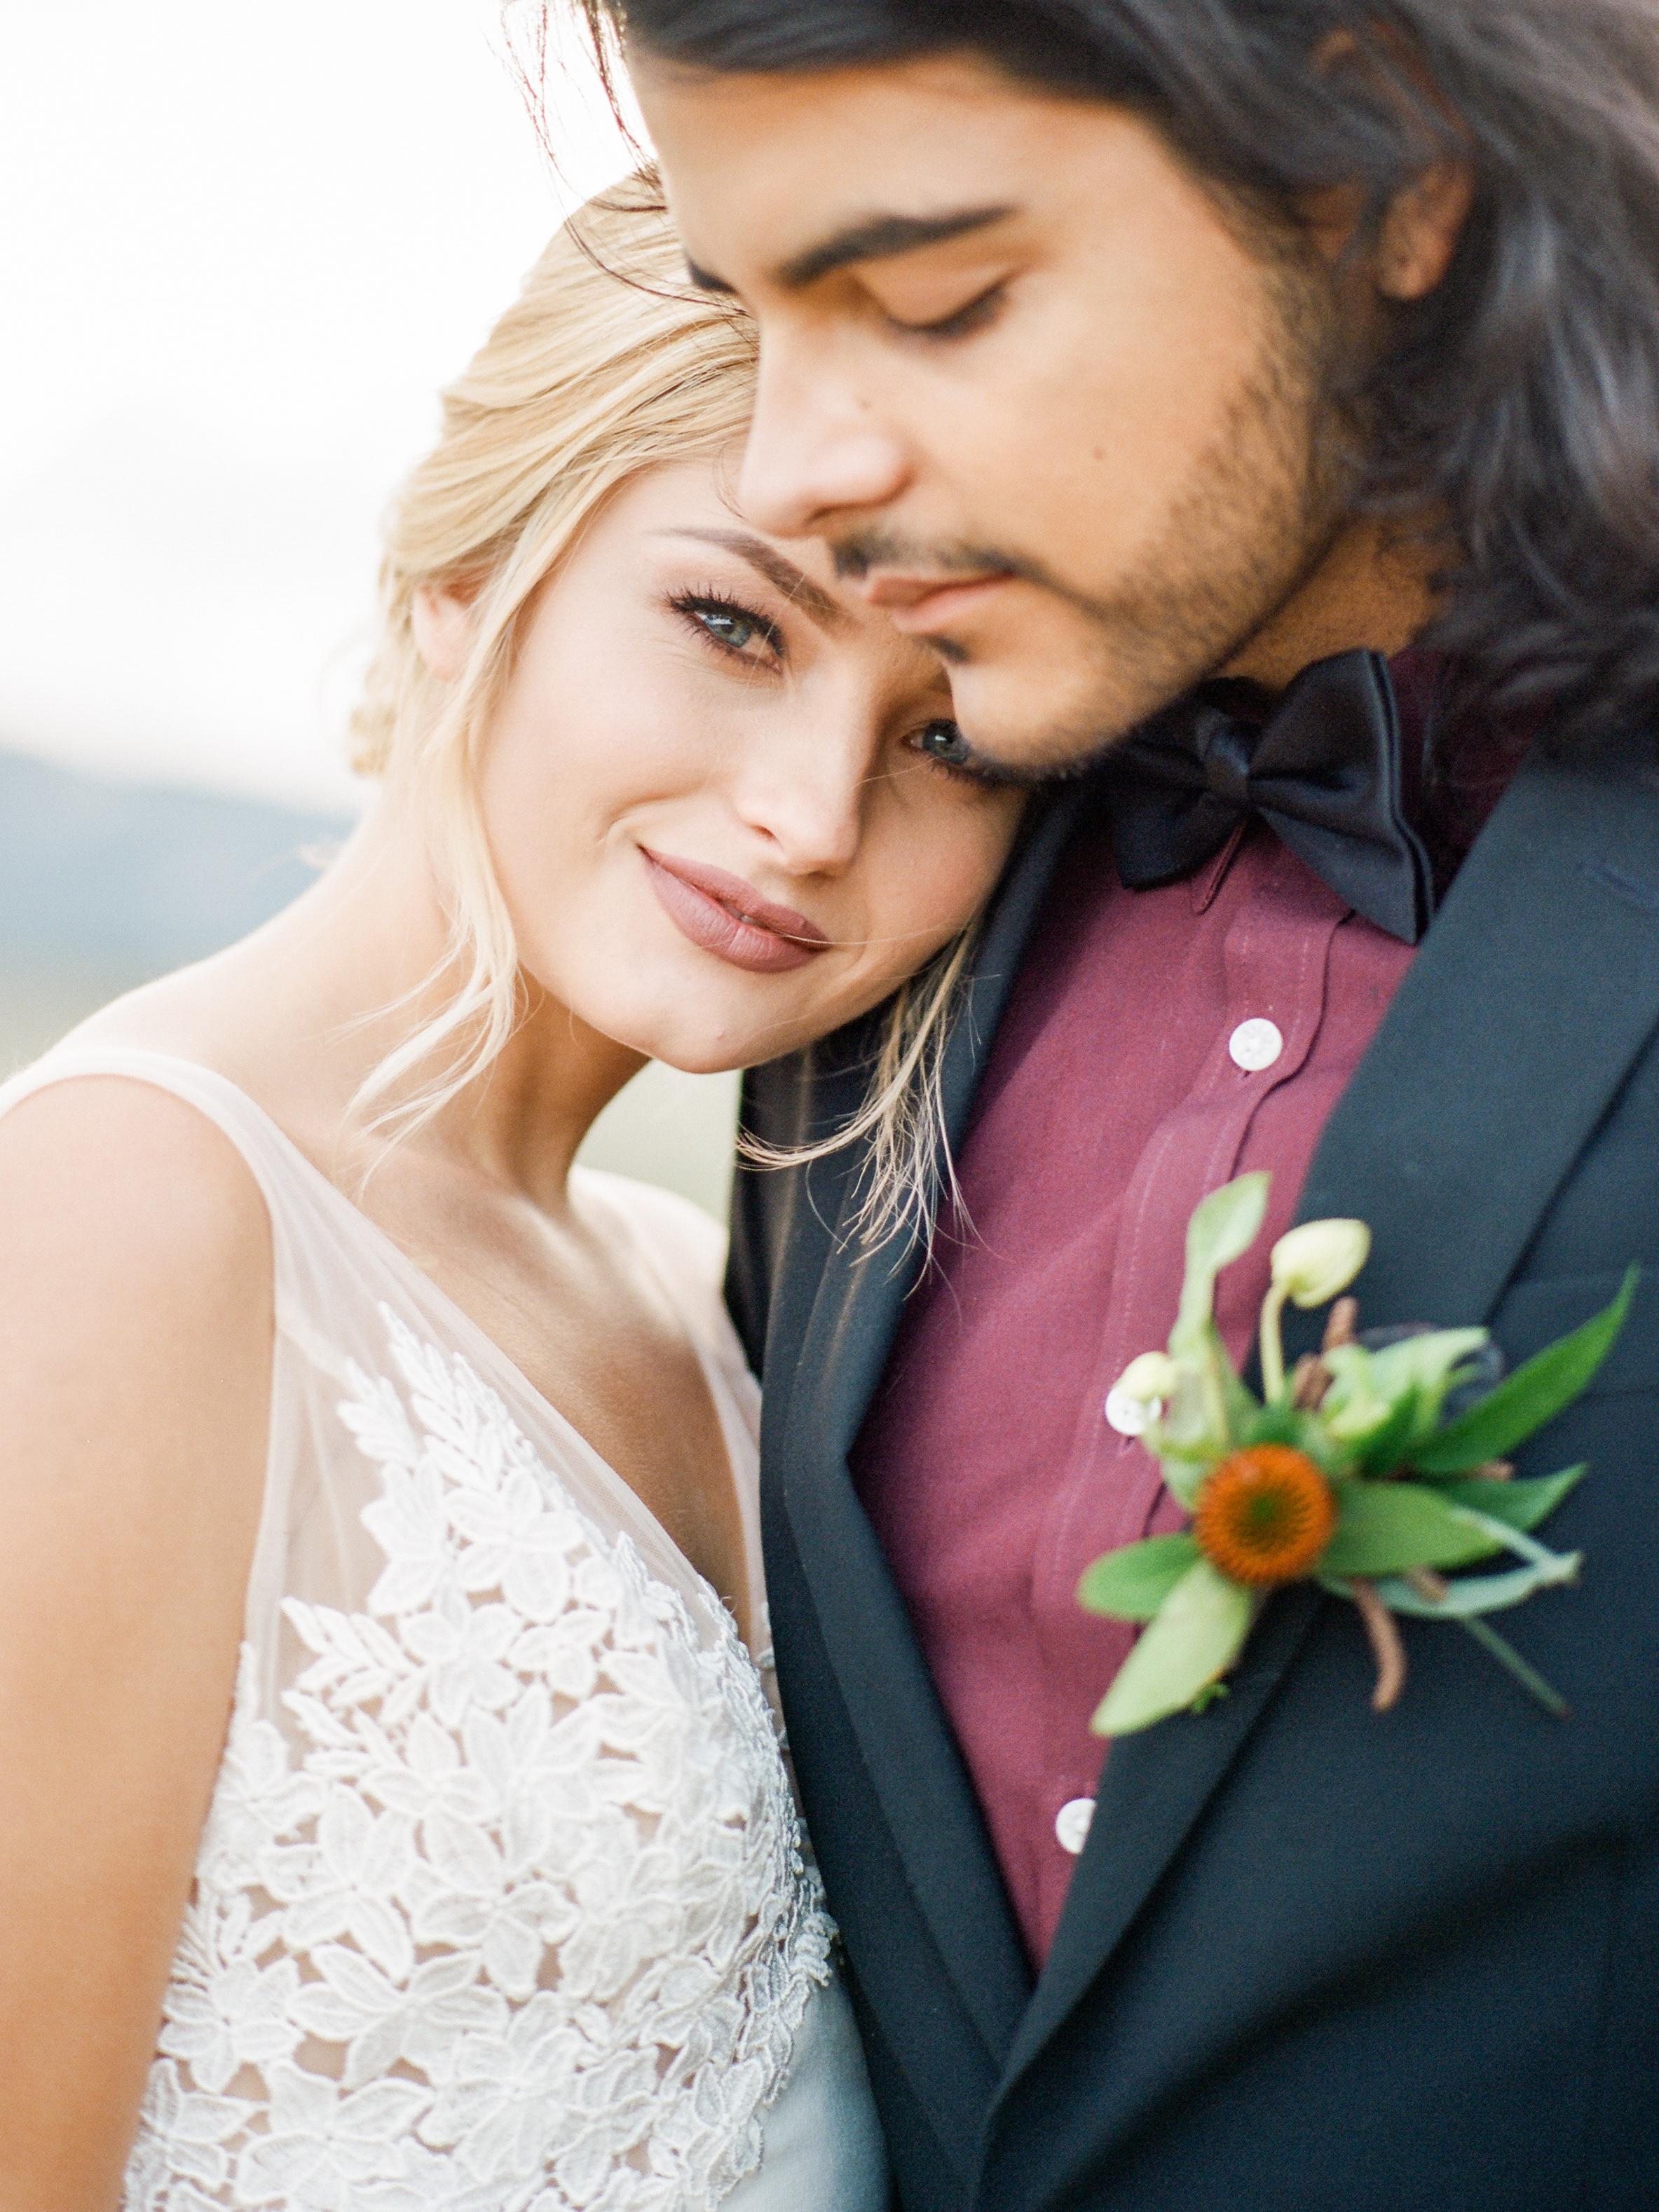 Bozeman-Big Sky-Montana-wedding-engagement-family-photographer-0165.jpg